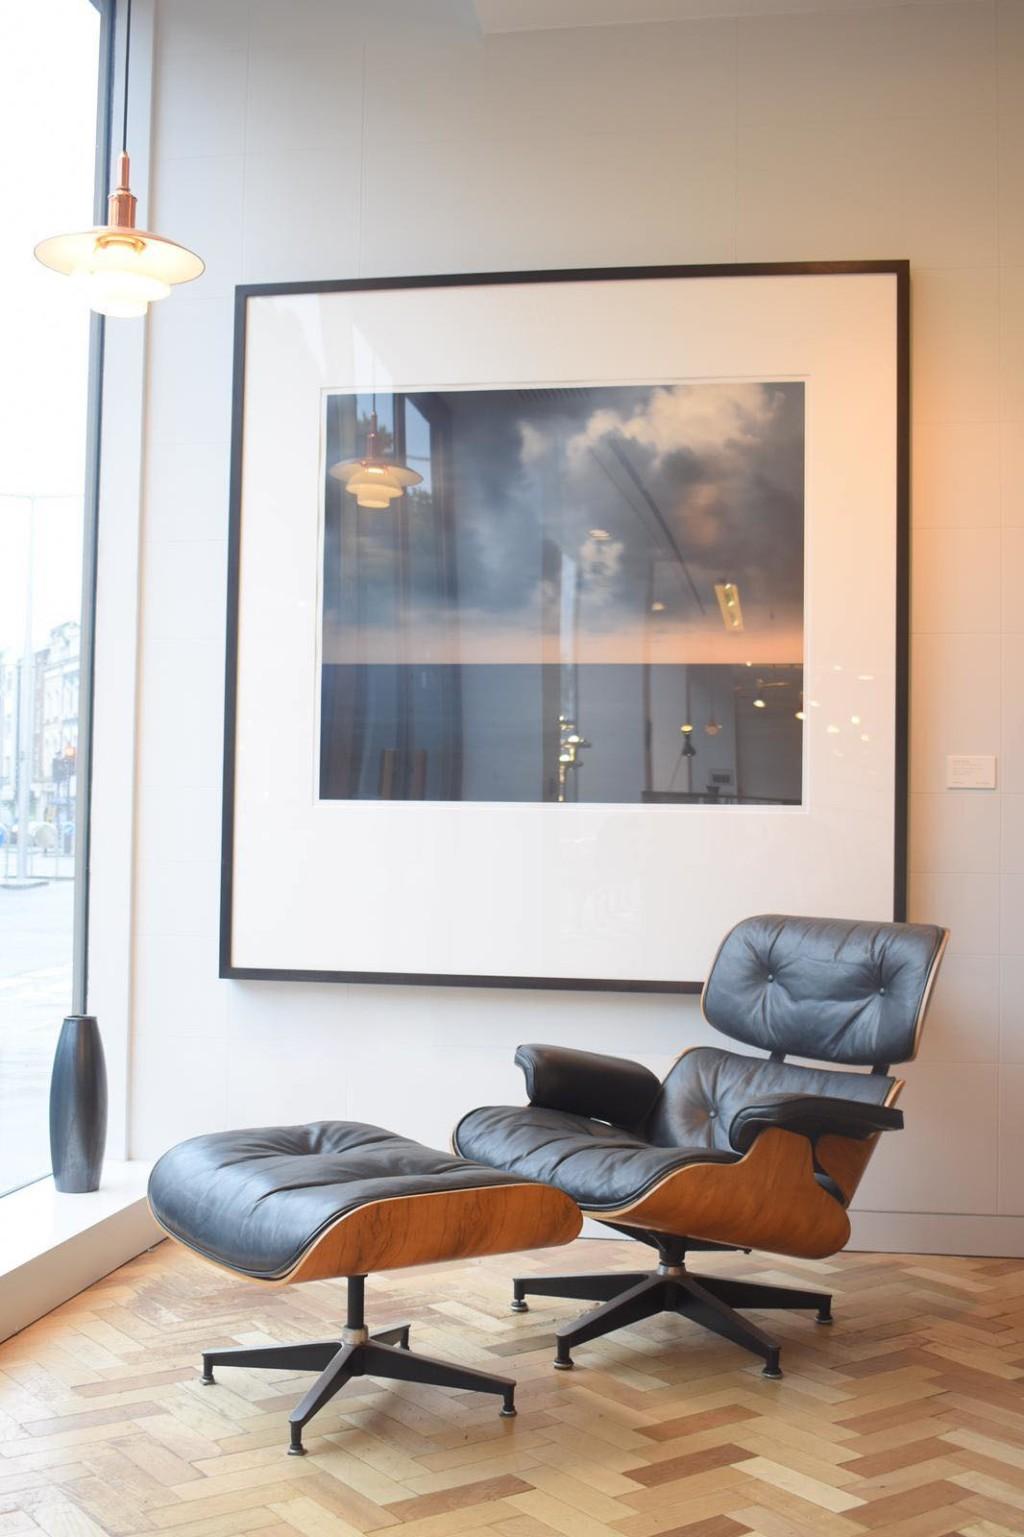 Showcasing Work from Award Winning Fine Art Photographer David Magee